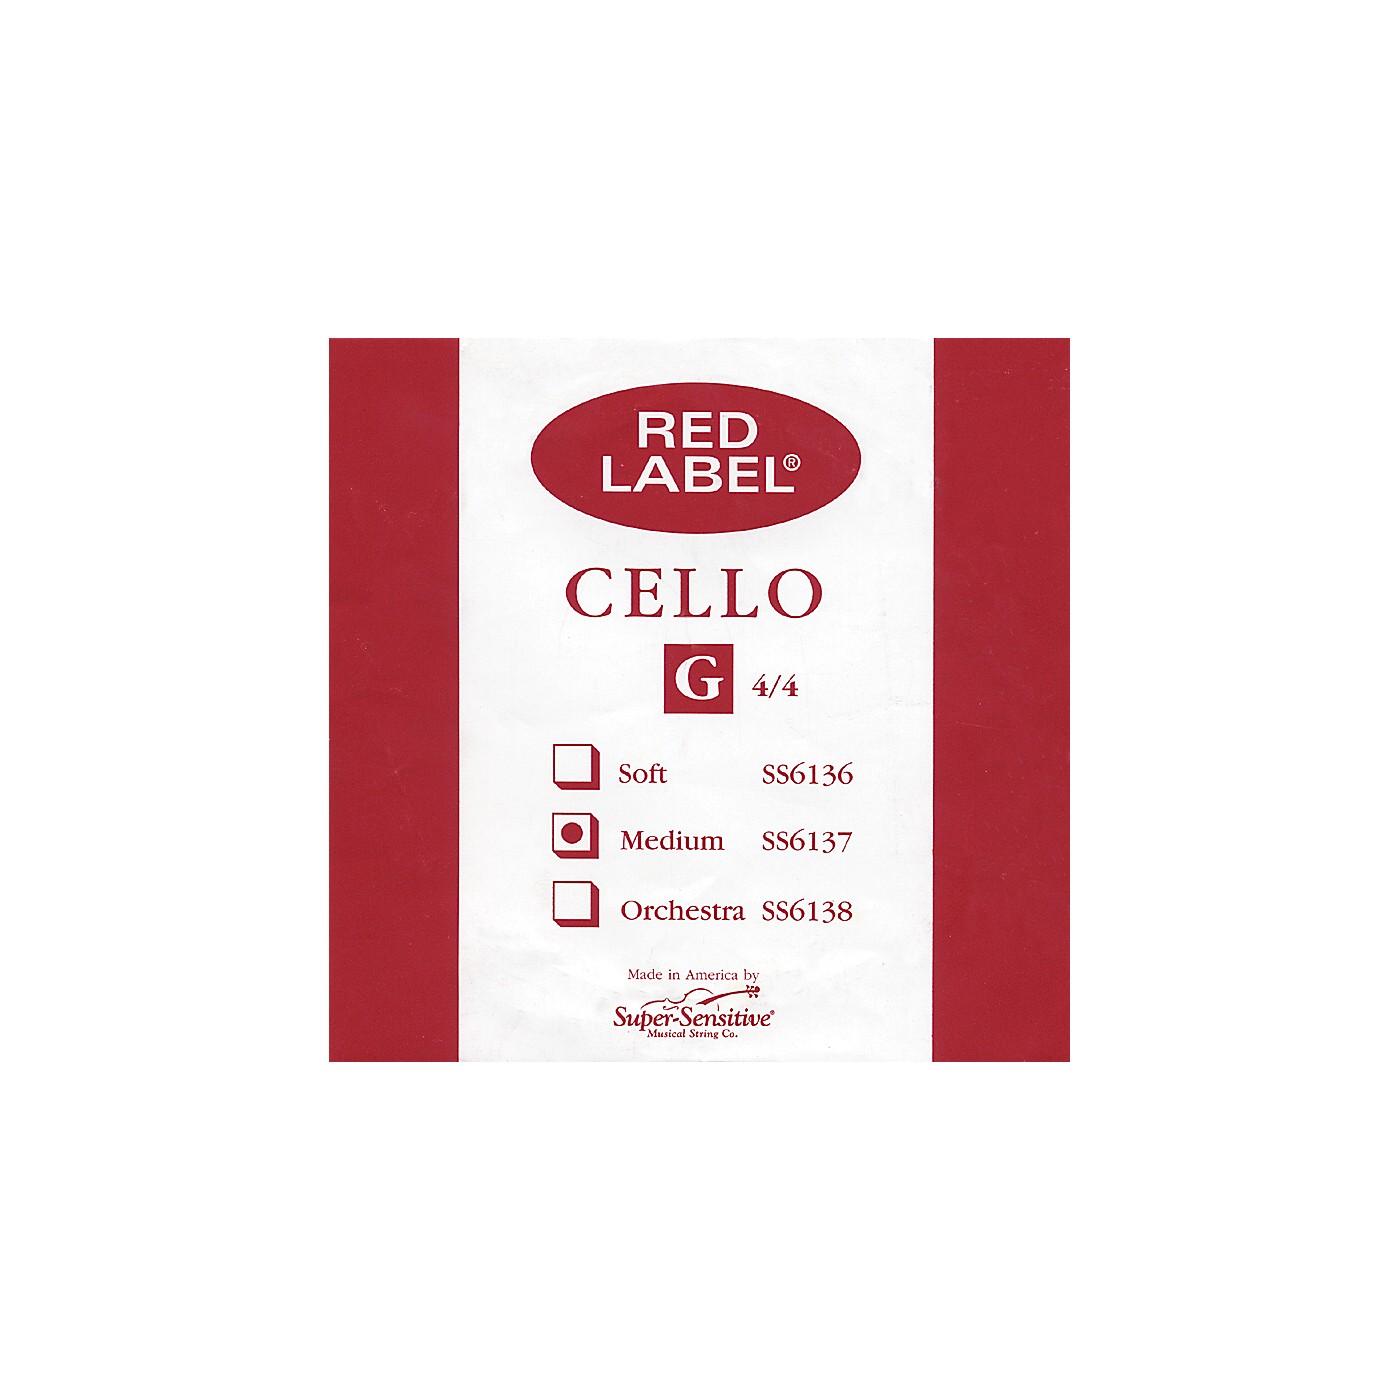 Super Sensitive Red Label Cello G String thumbnail